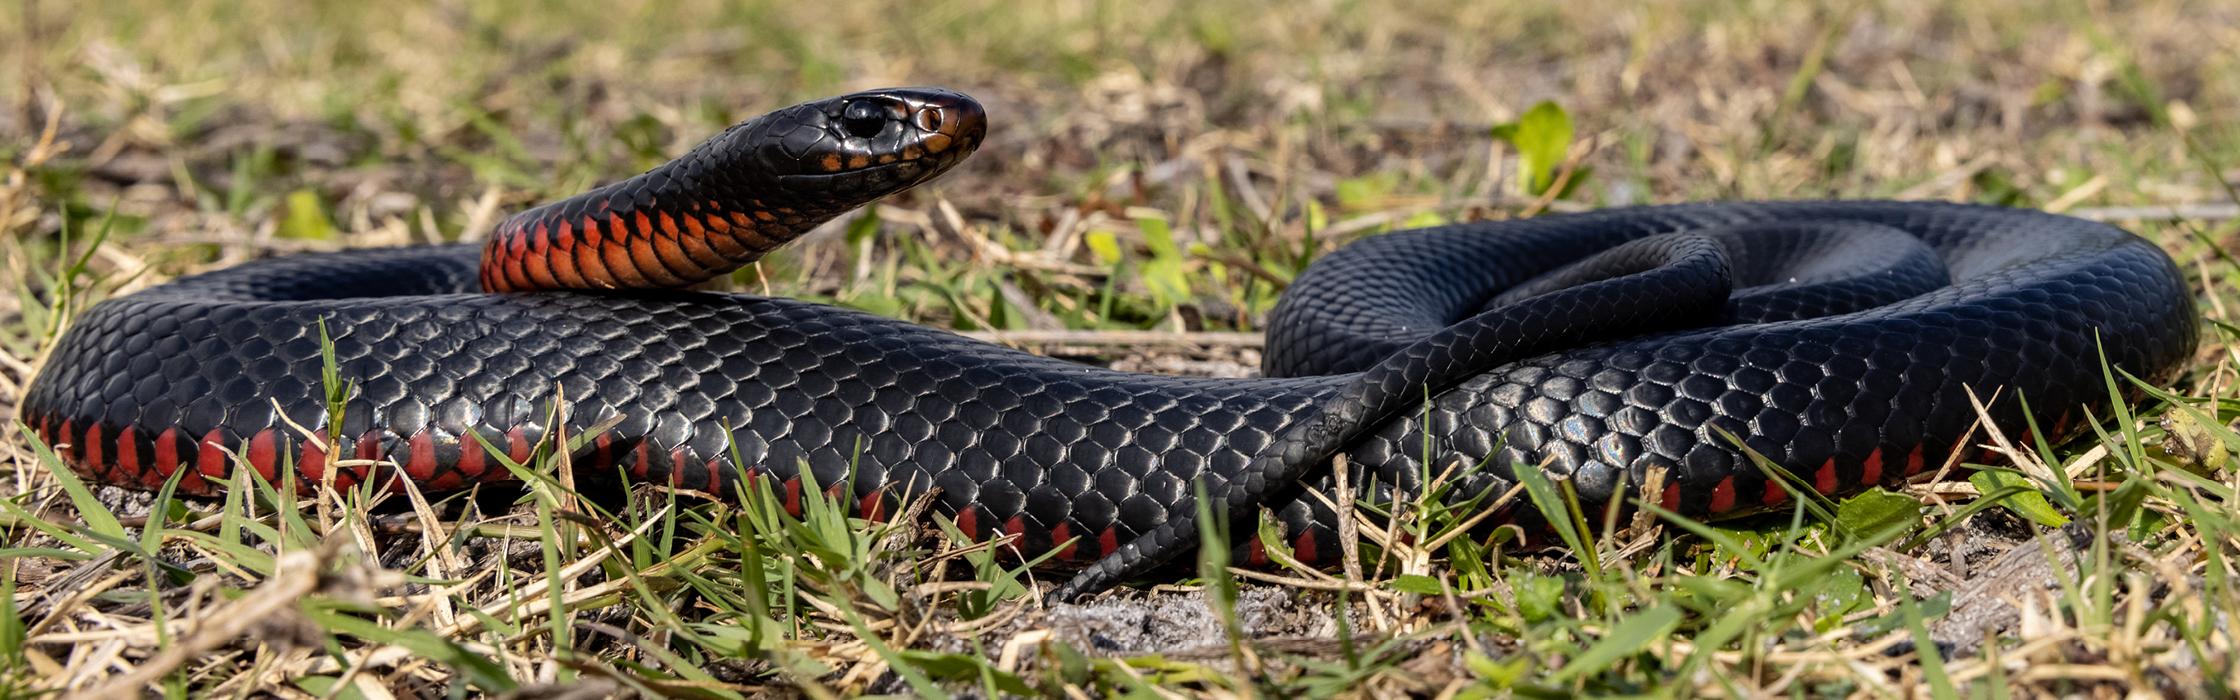 Red-bellied Black Snake Australia Zoo